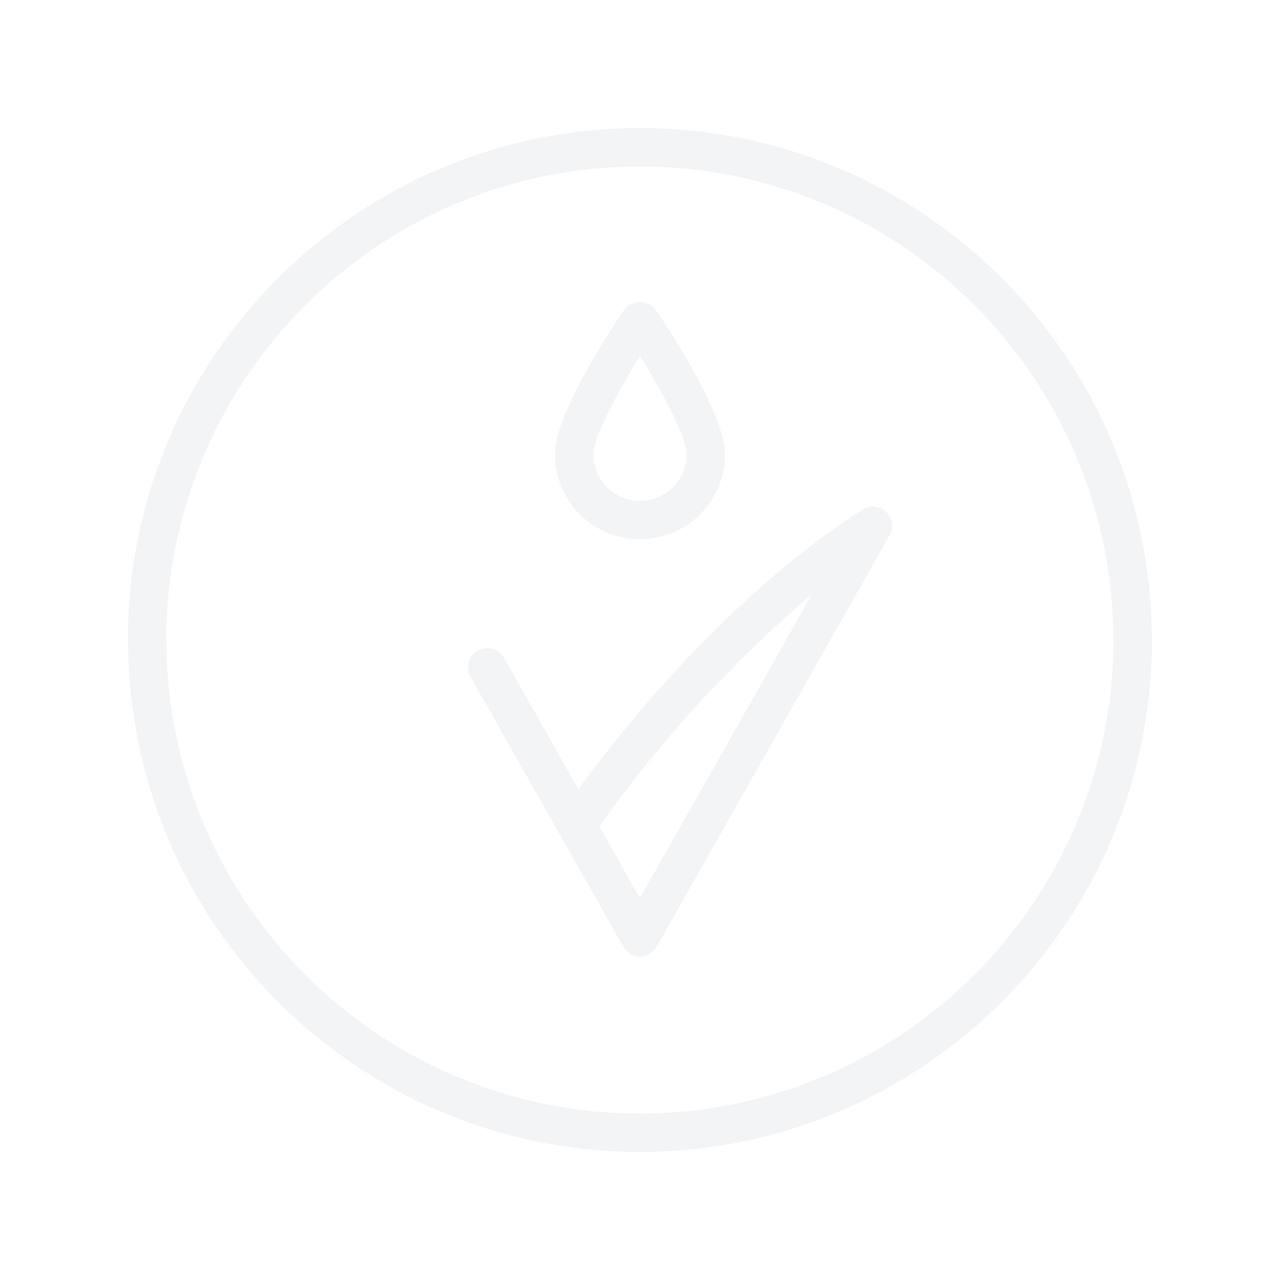 HOLIKA HOLIKA Aloe Soothing Essence Water Drop Sun Stick SPF50 17g